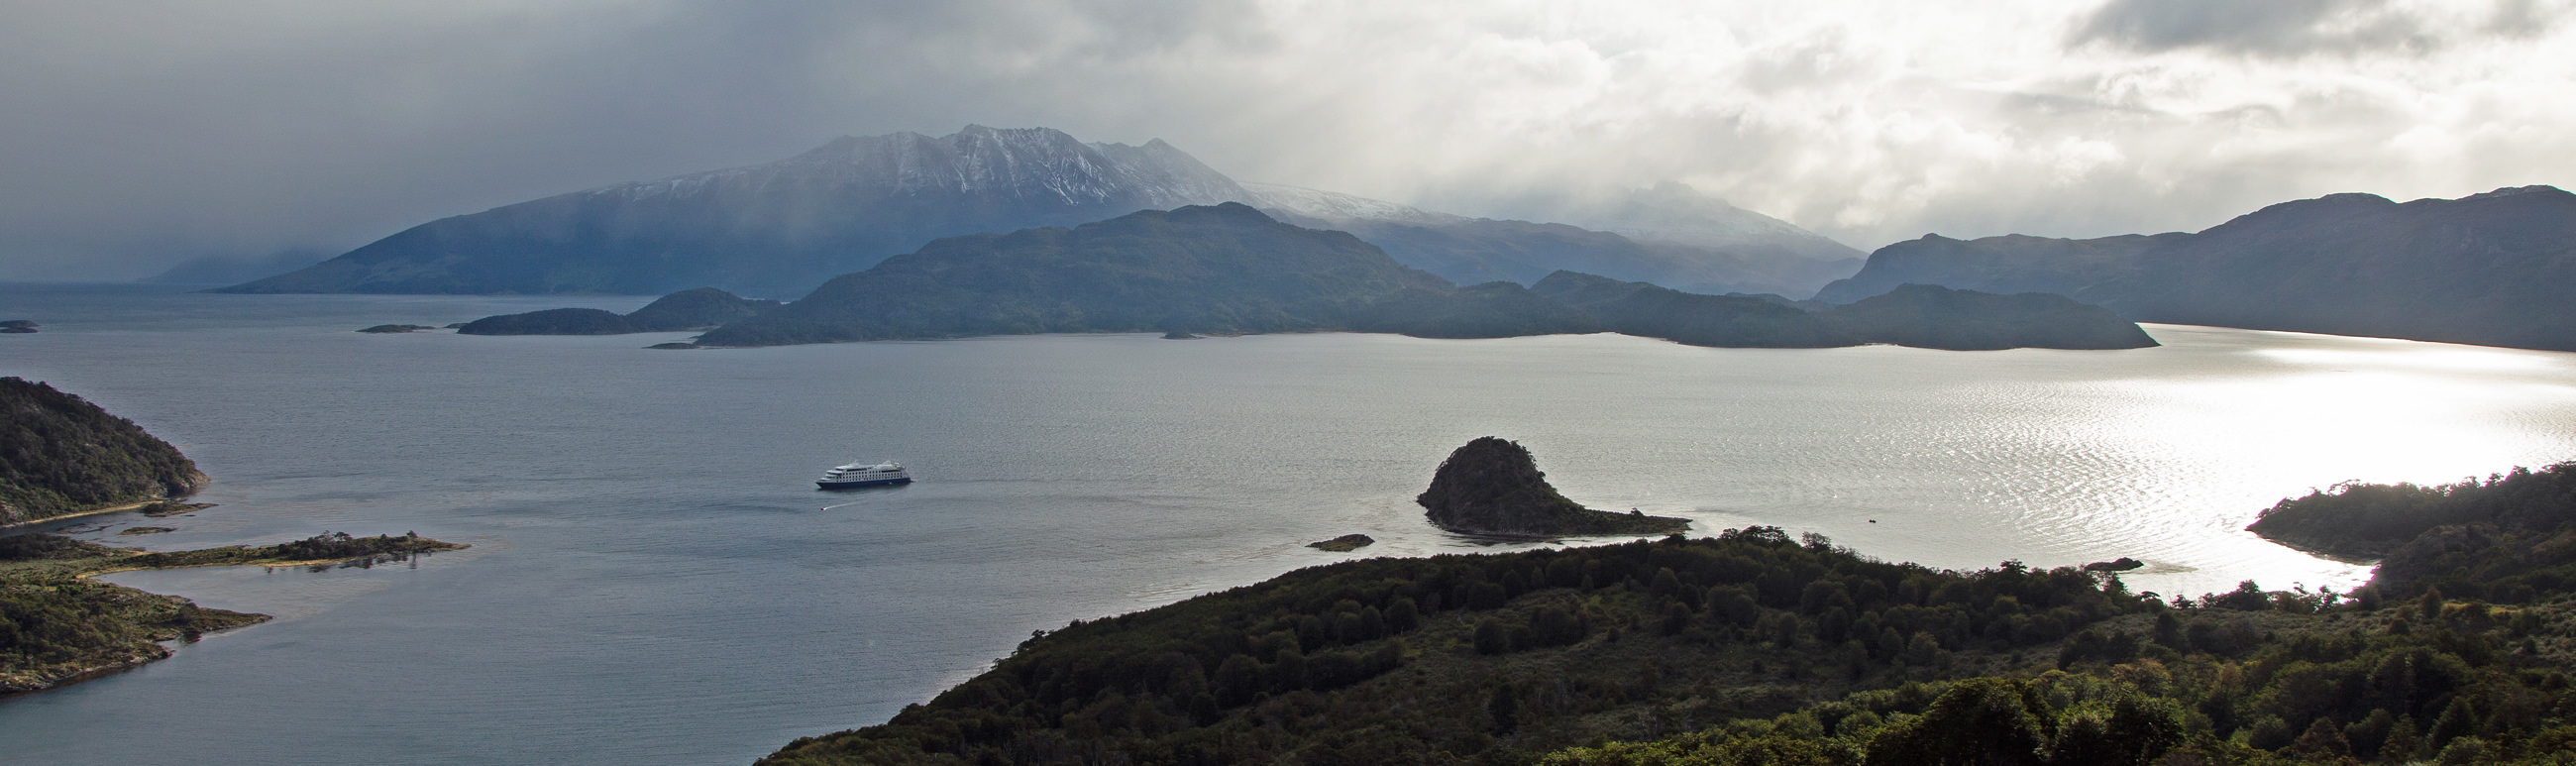 Australis Cruise Patagonia Atacama7